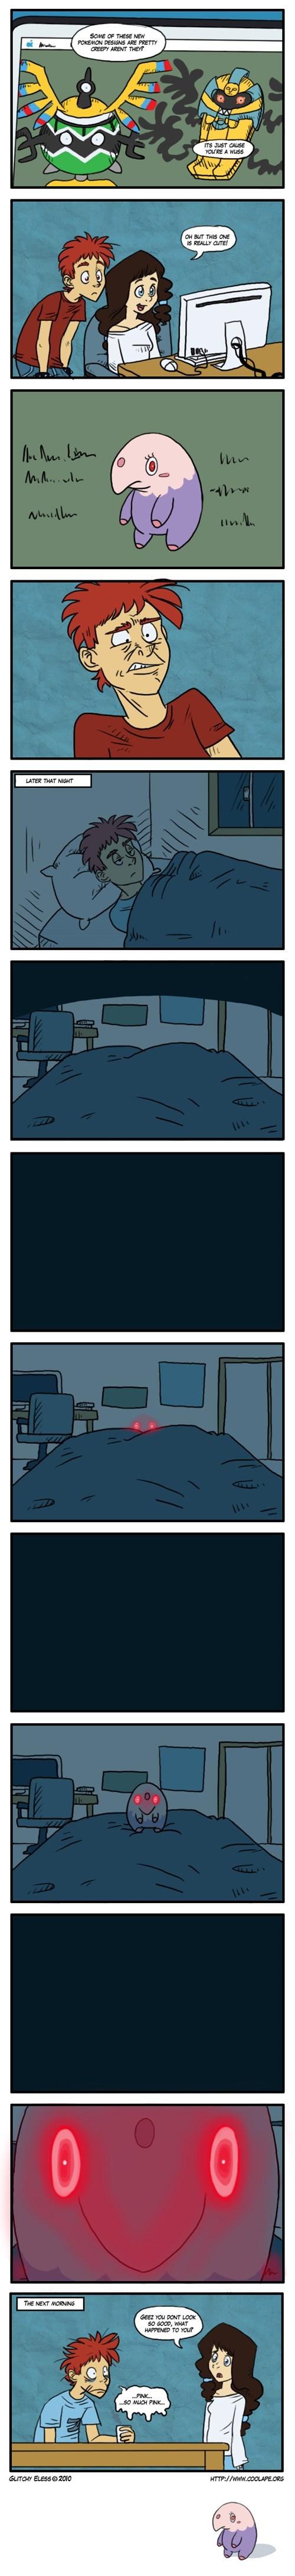 munna pink web comics - 7975305984